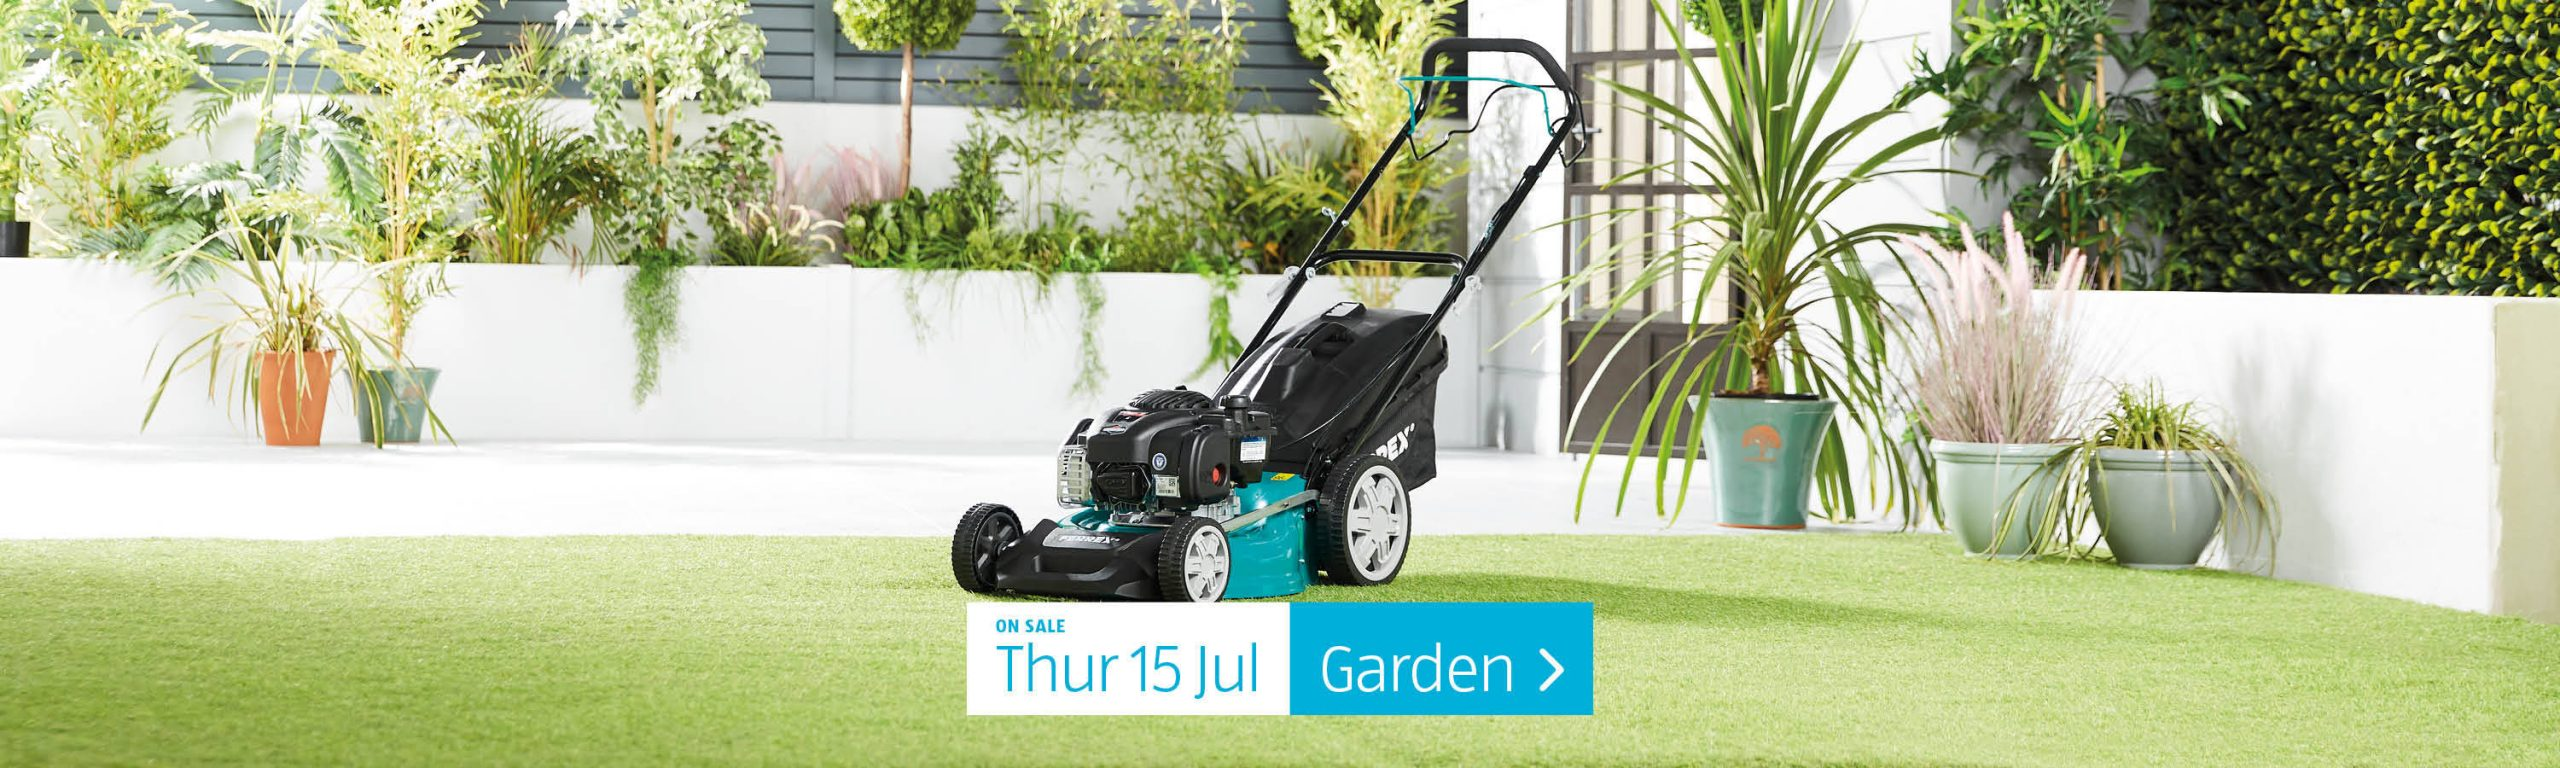 Aldi Special Buys Thursday, 15th July 2021 ALDI Garden